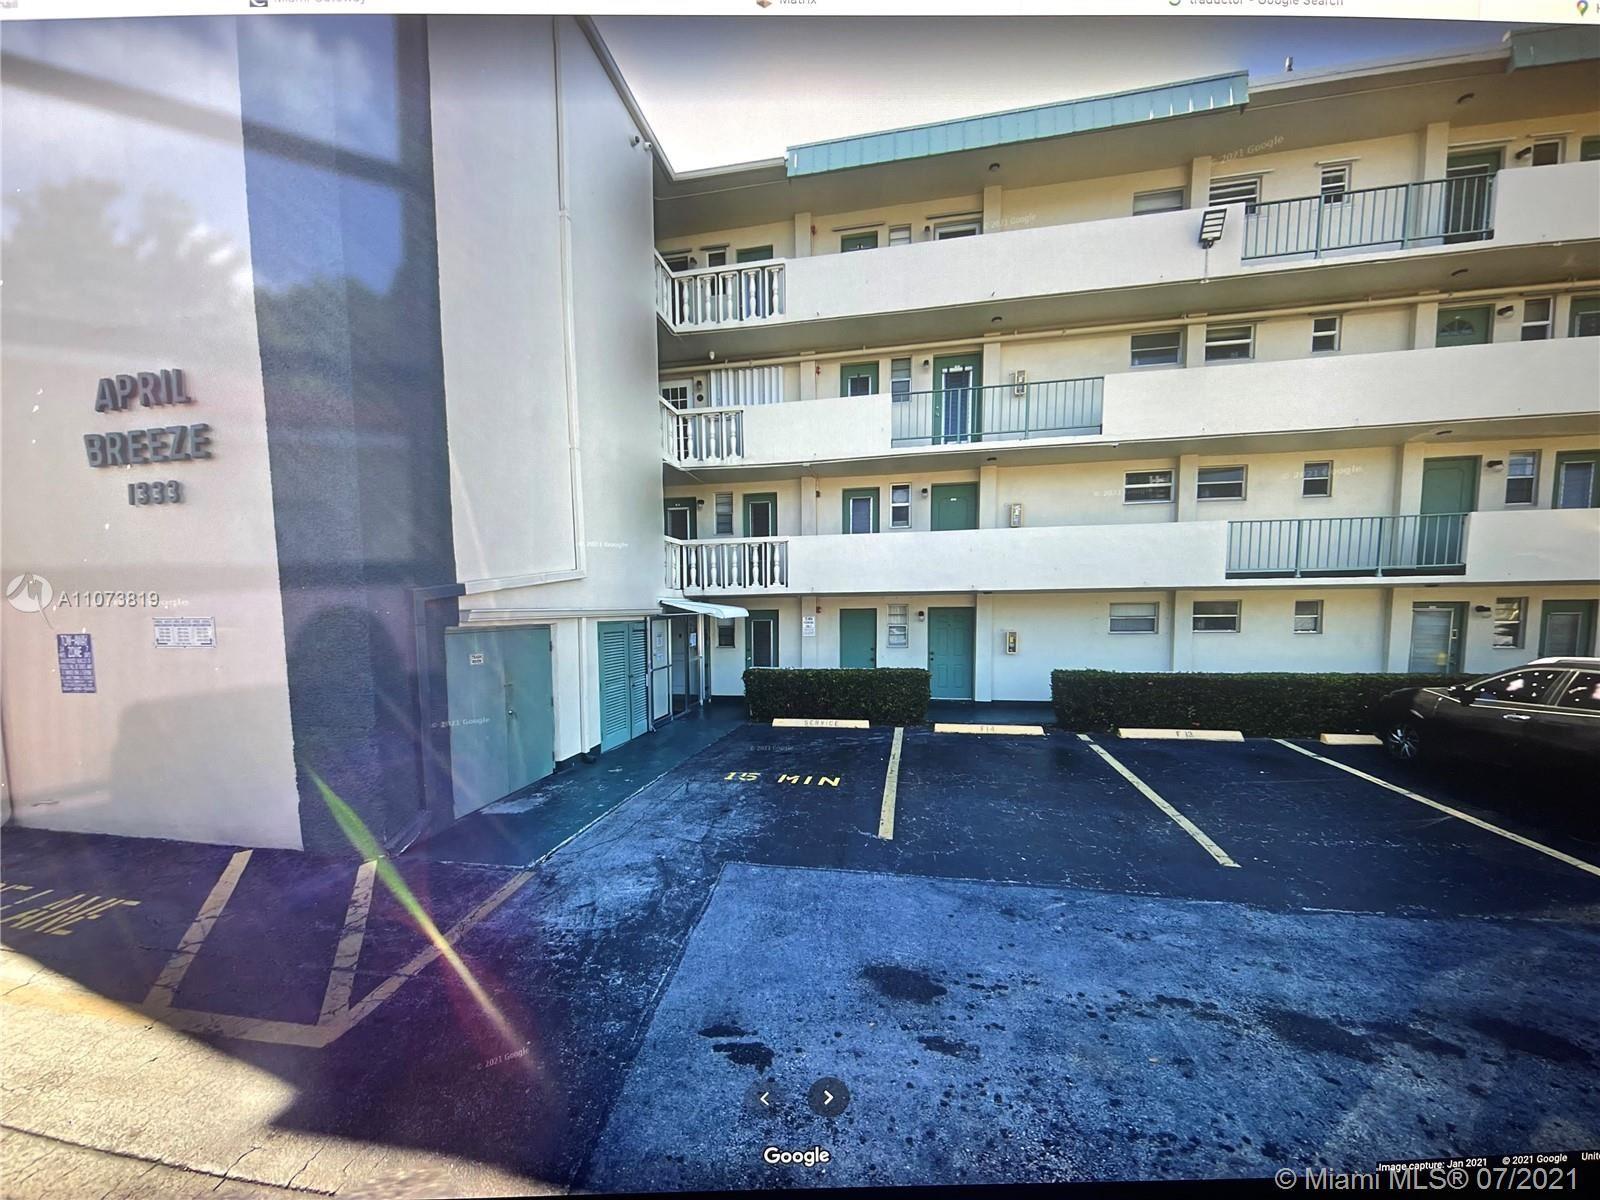 1333 E Hallandale Beach Blvd #244, Hallandale Beach, FL 33009 - #: A11073819